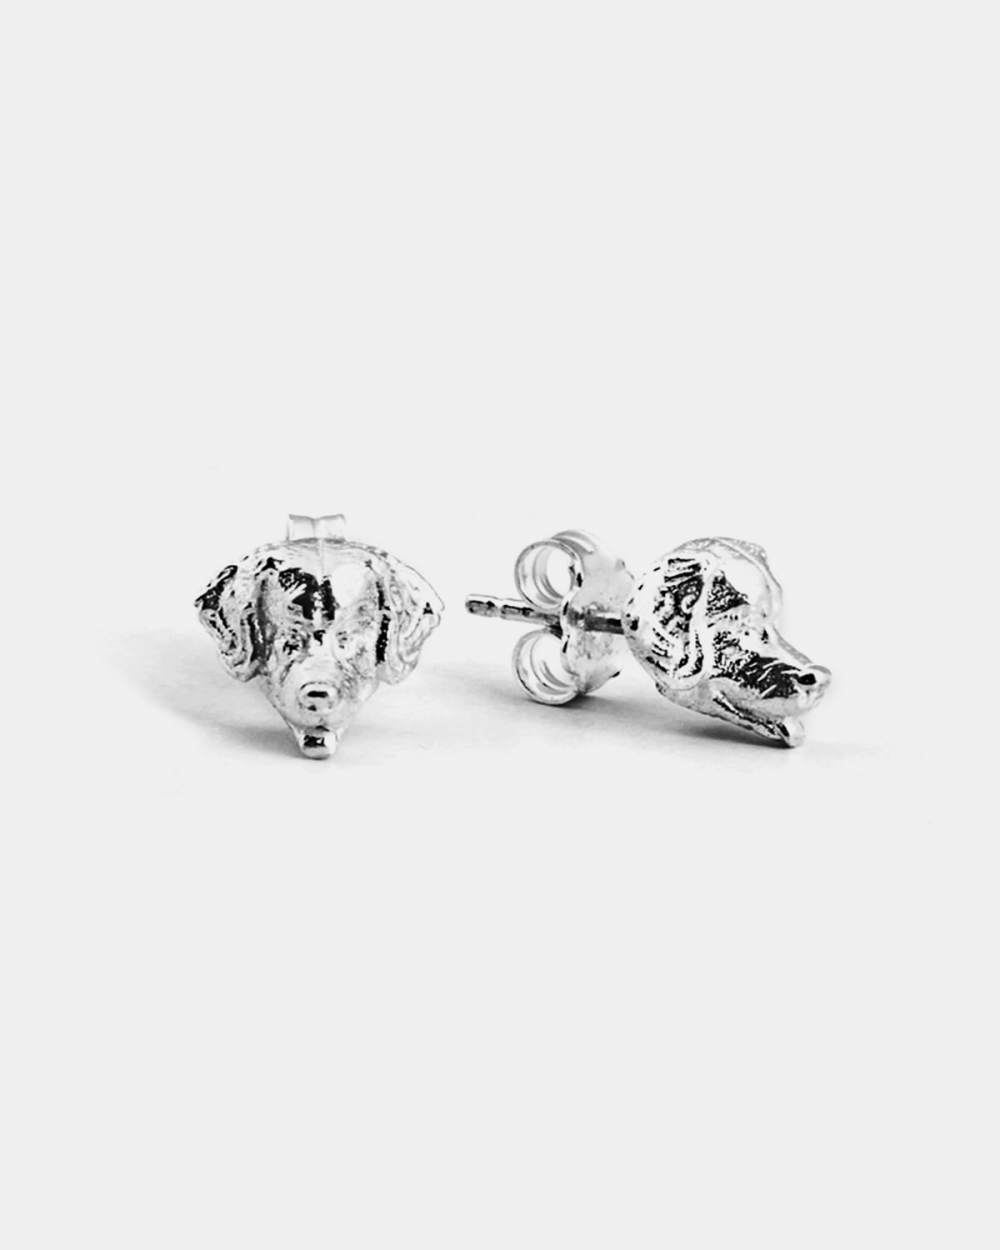 golden retriever couple earrings polished silver